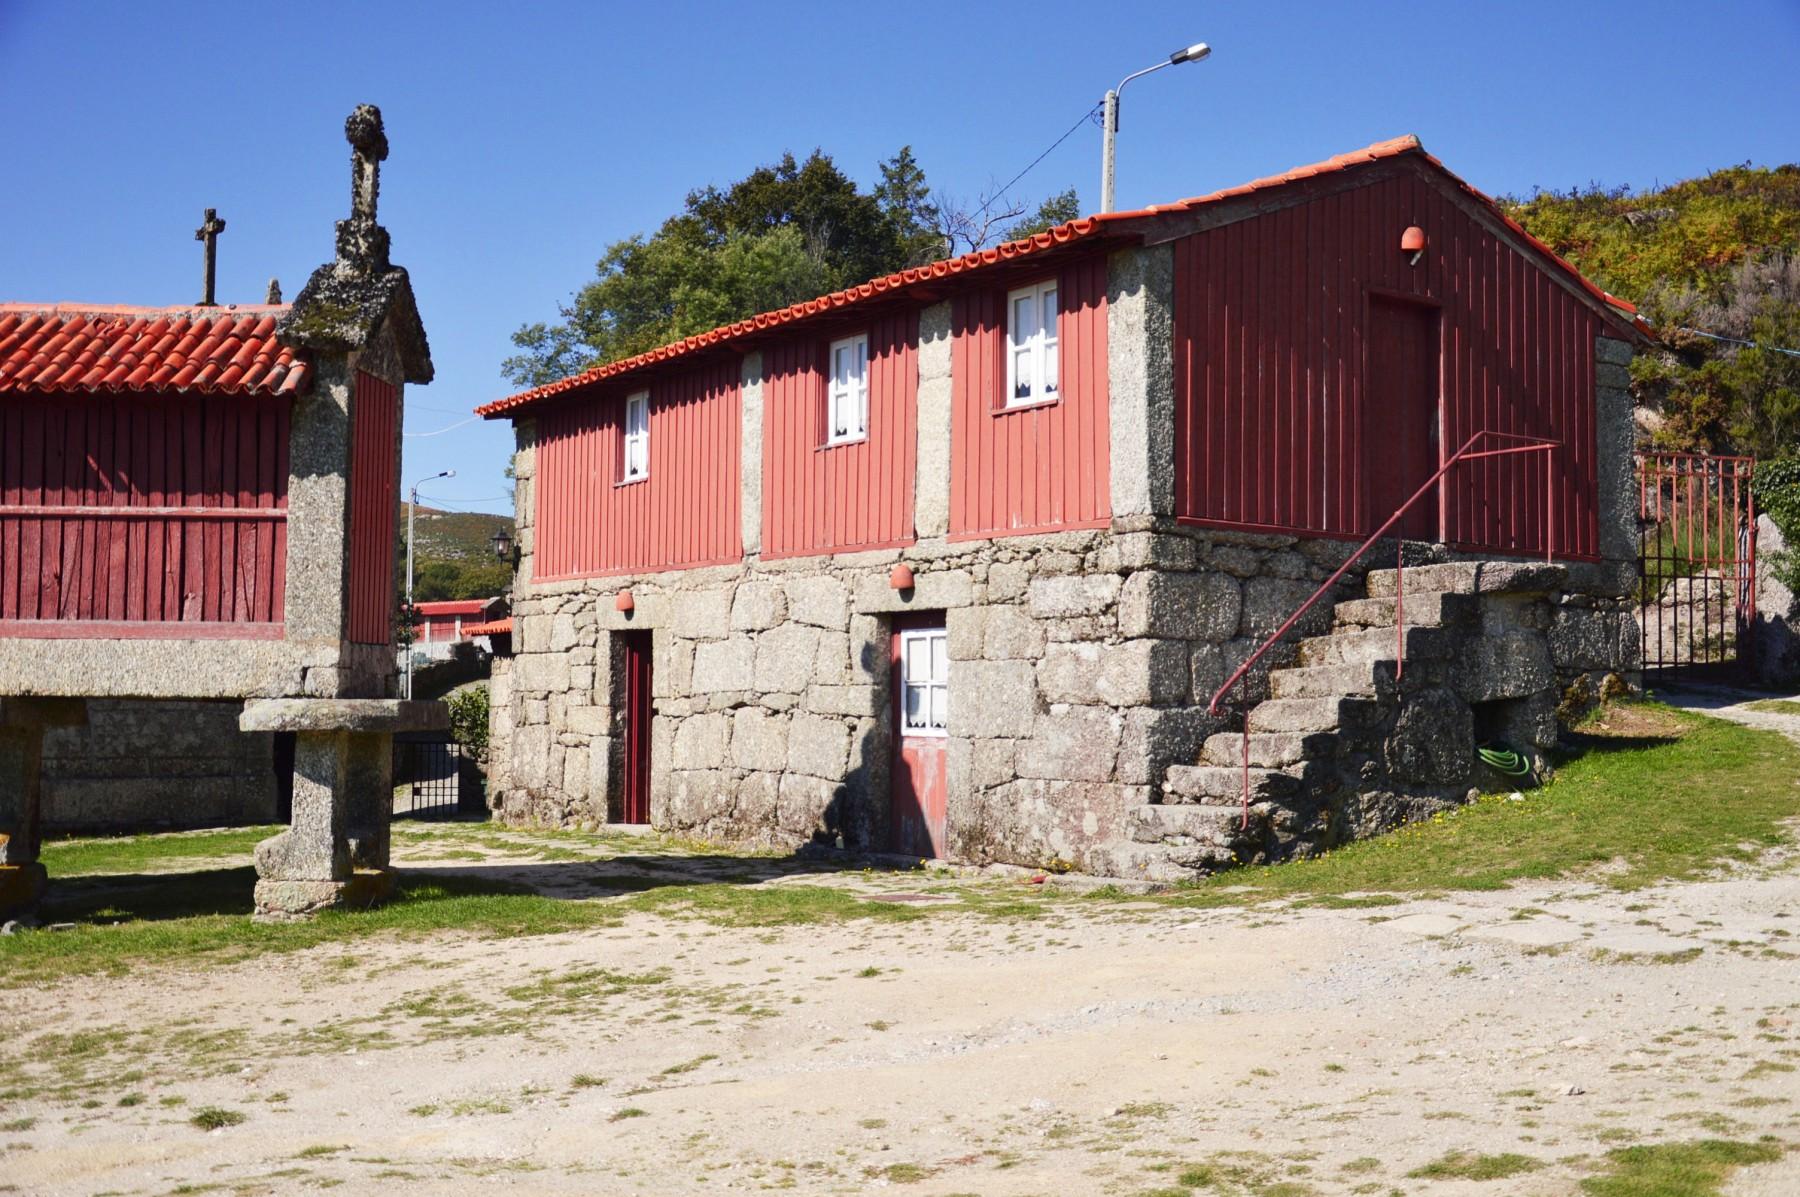 Rural houses in ger s casa dos bernardos t0 for Cottage e casa